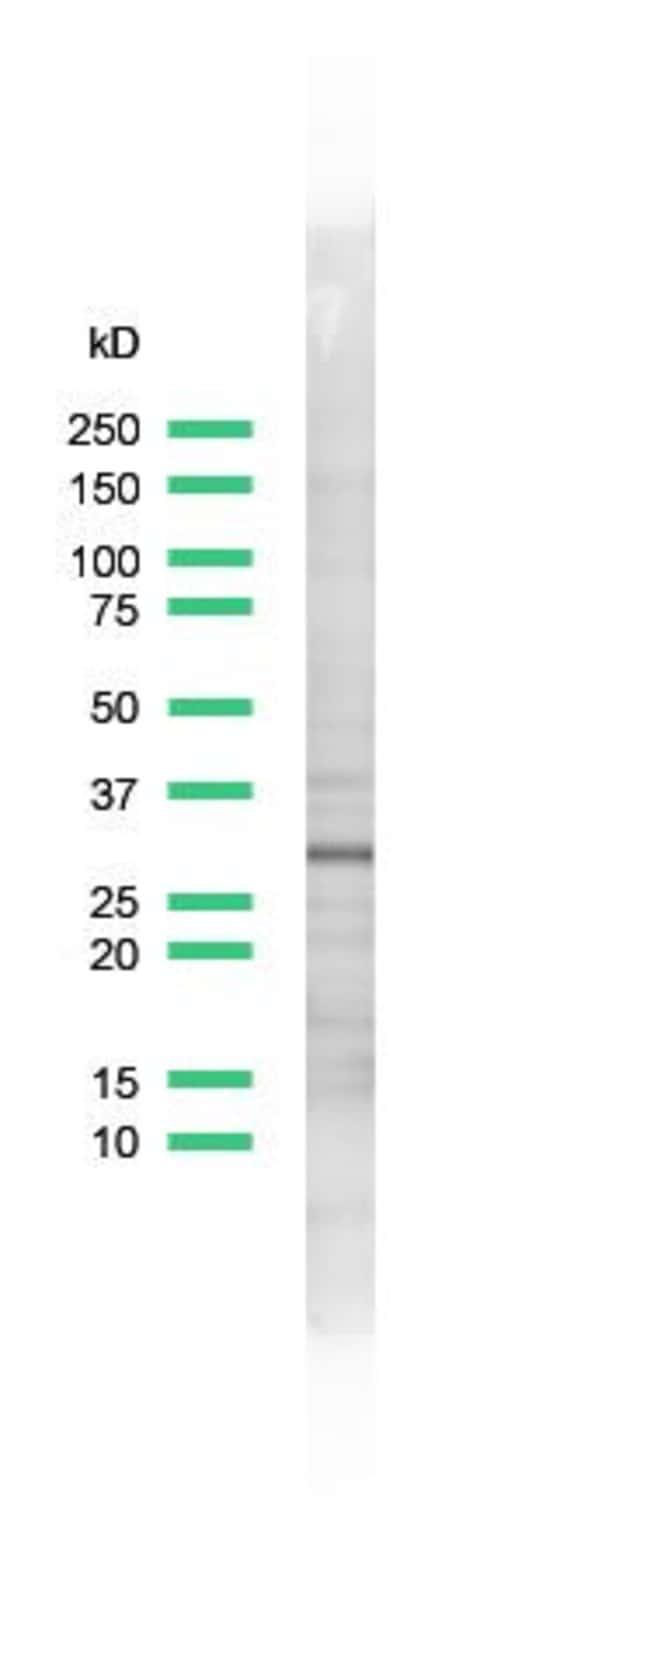 CDK1 Rabbit anti-Human, Polyclonal, Invitrogen 1 mL; Unconjugated:Antibodies